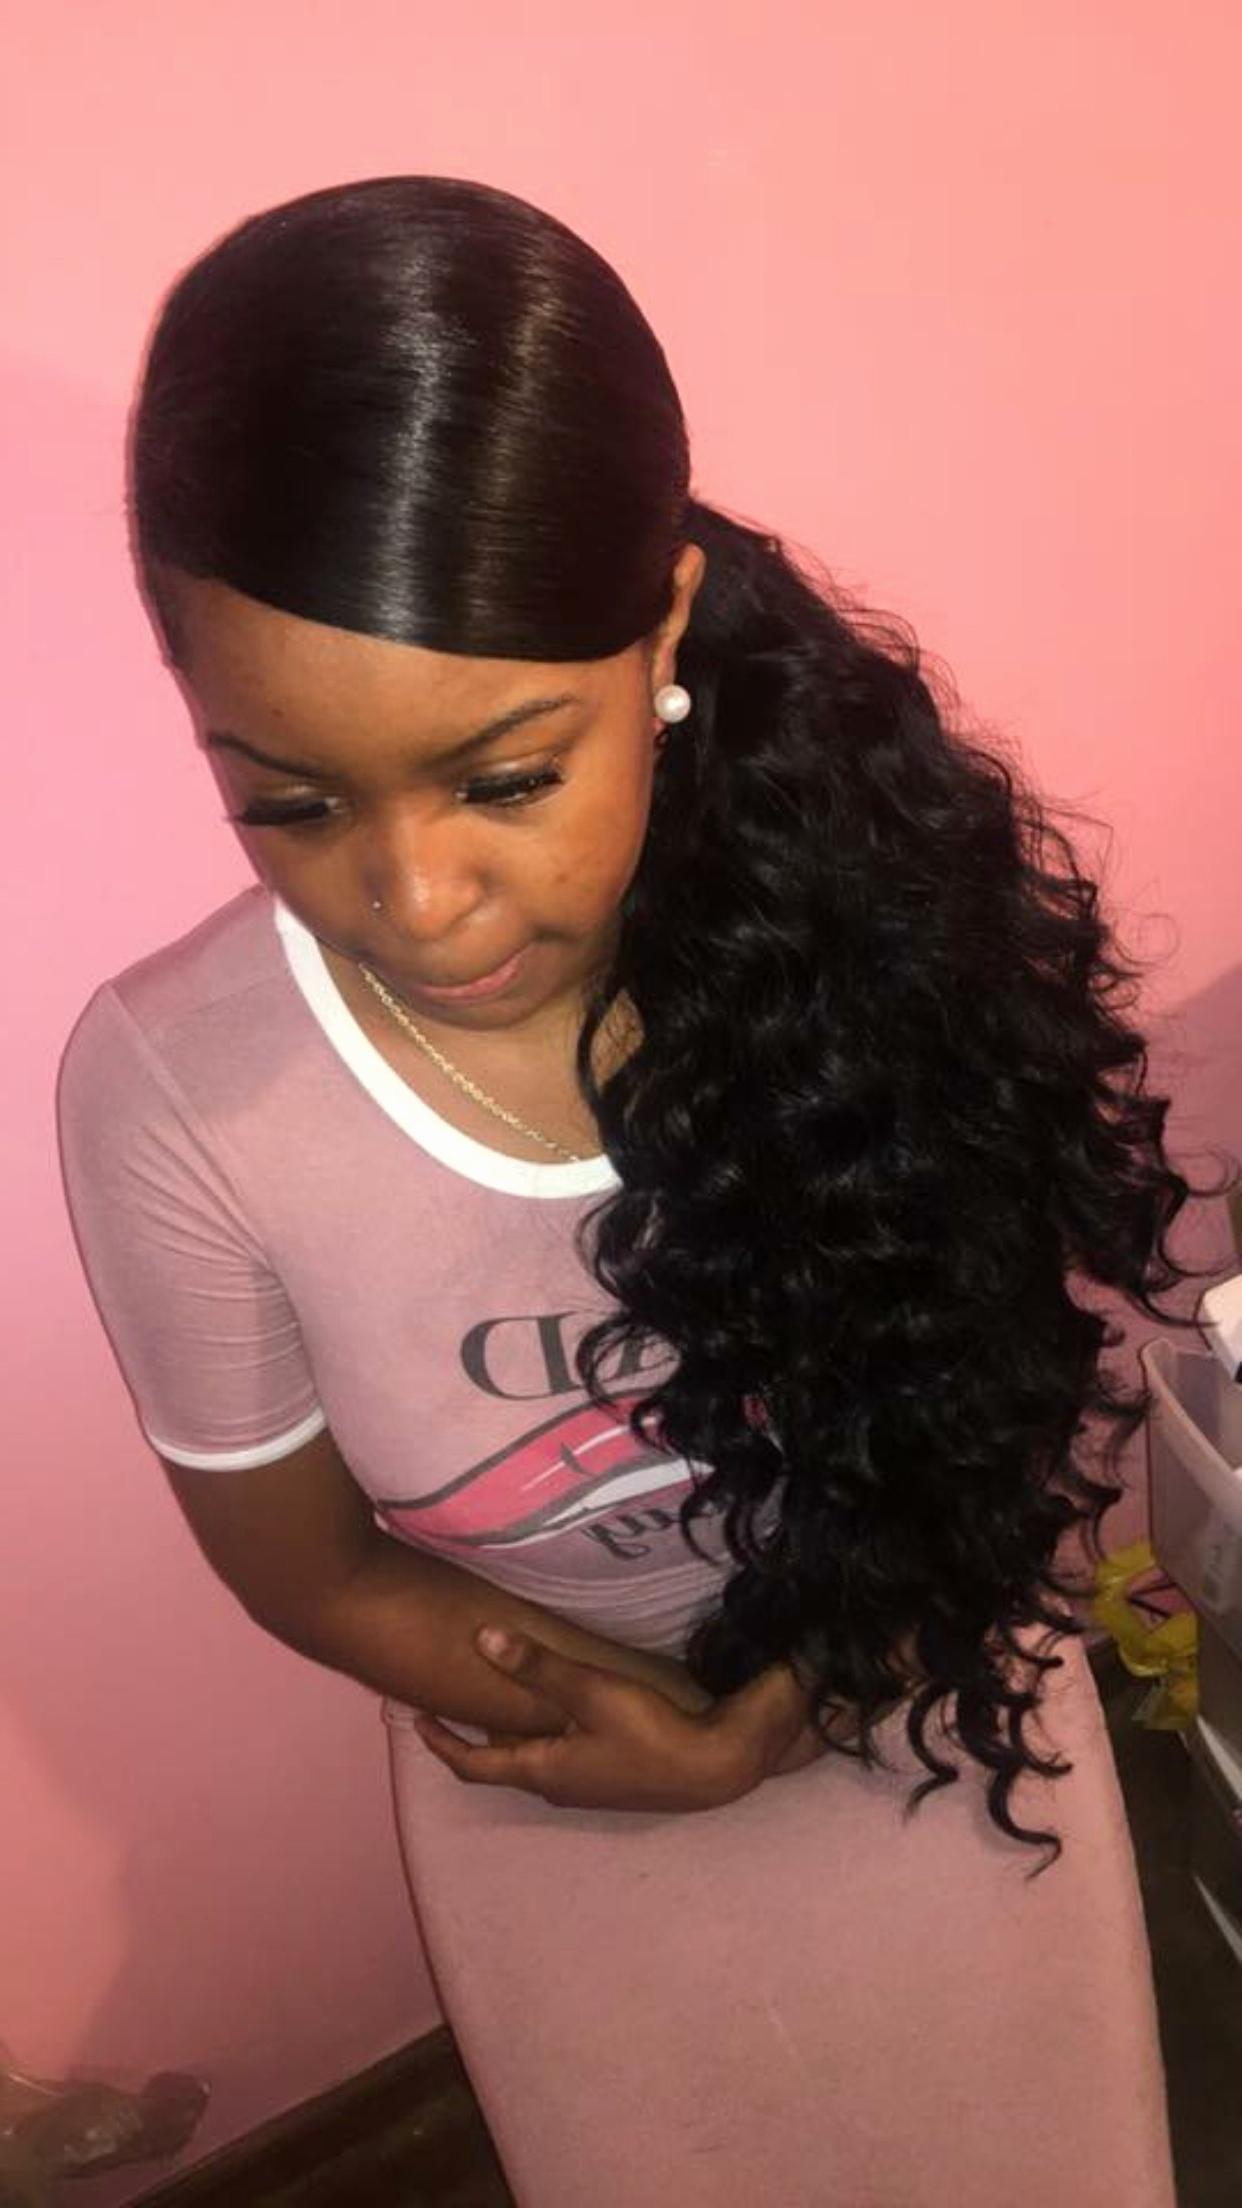 Best Of Little Black Girl Short Hairstyles – Hardeeplive For Black Little Girl Short Hairstyles (View 5 of 25)